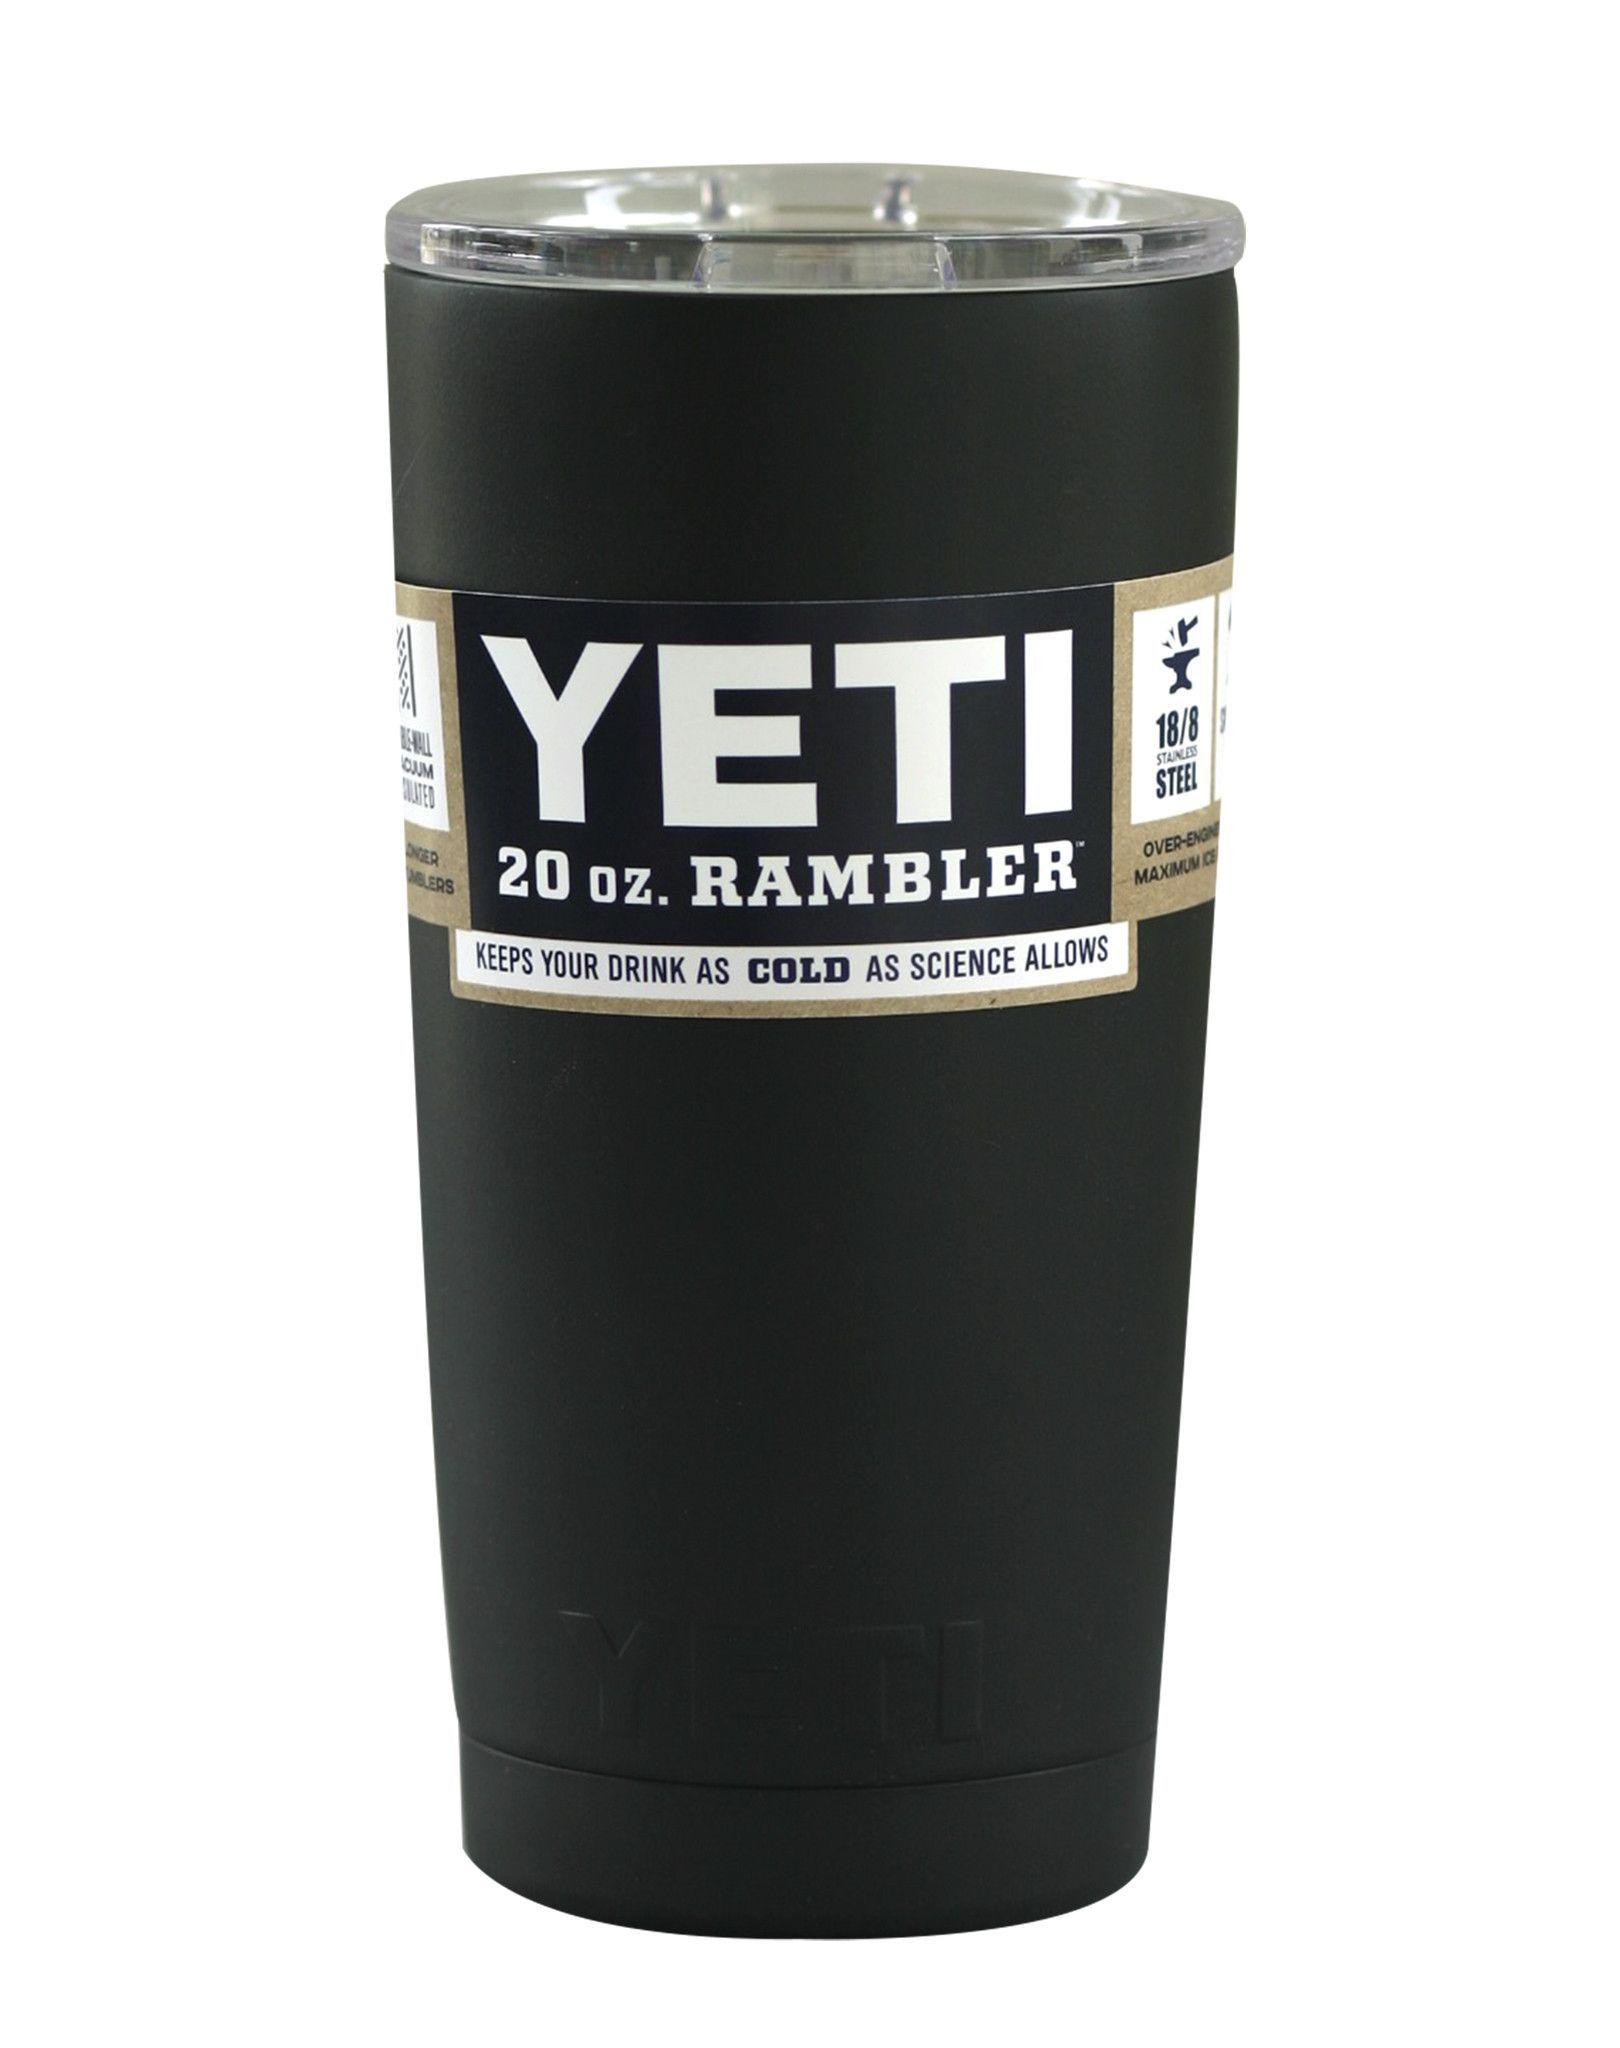 Matte Black YETI 20 oz Rambler Tumbler